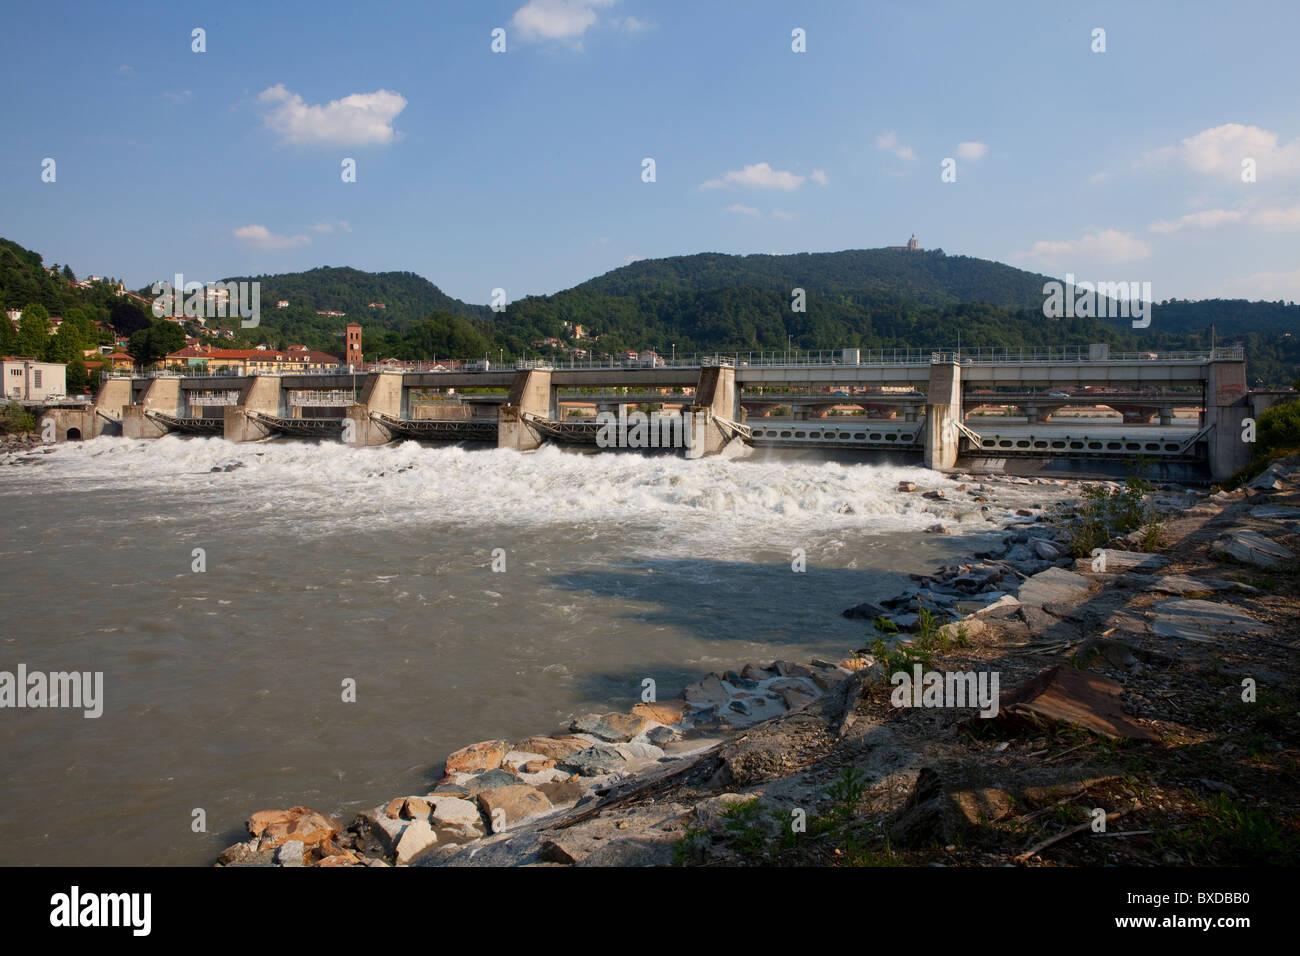 River, Bank - Stock Image